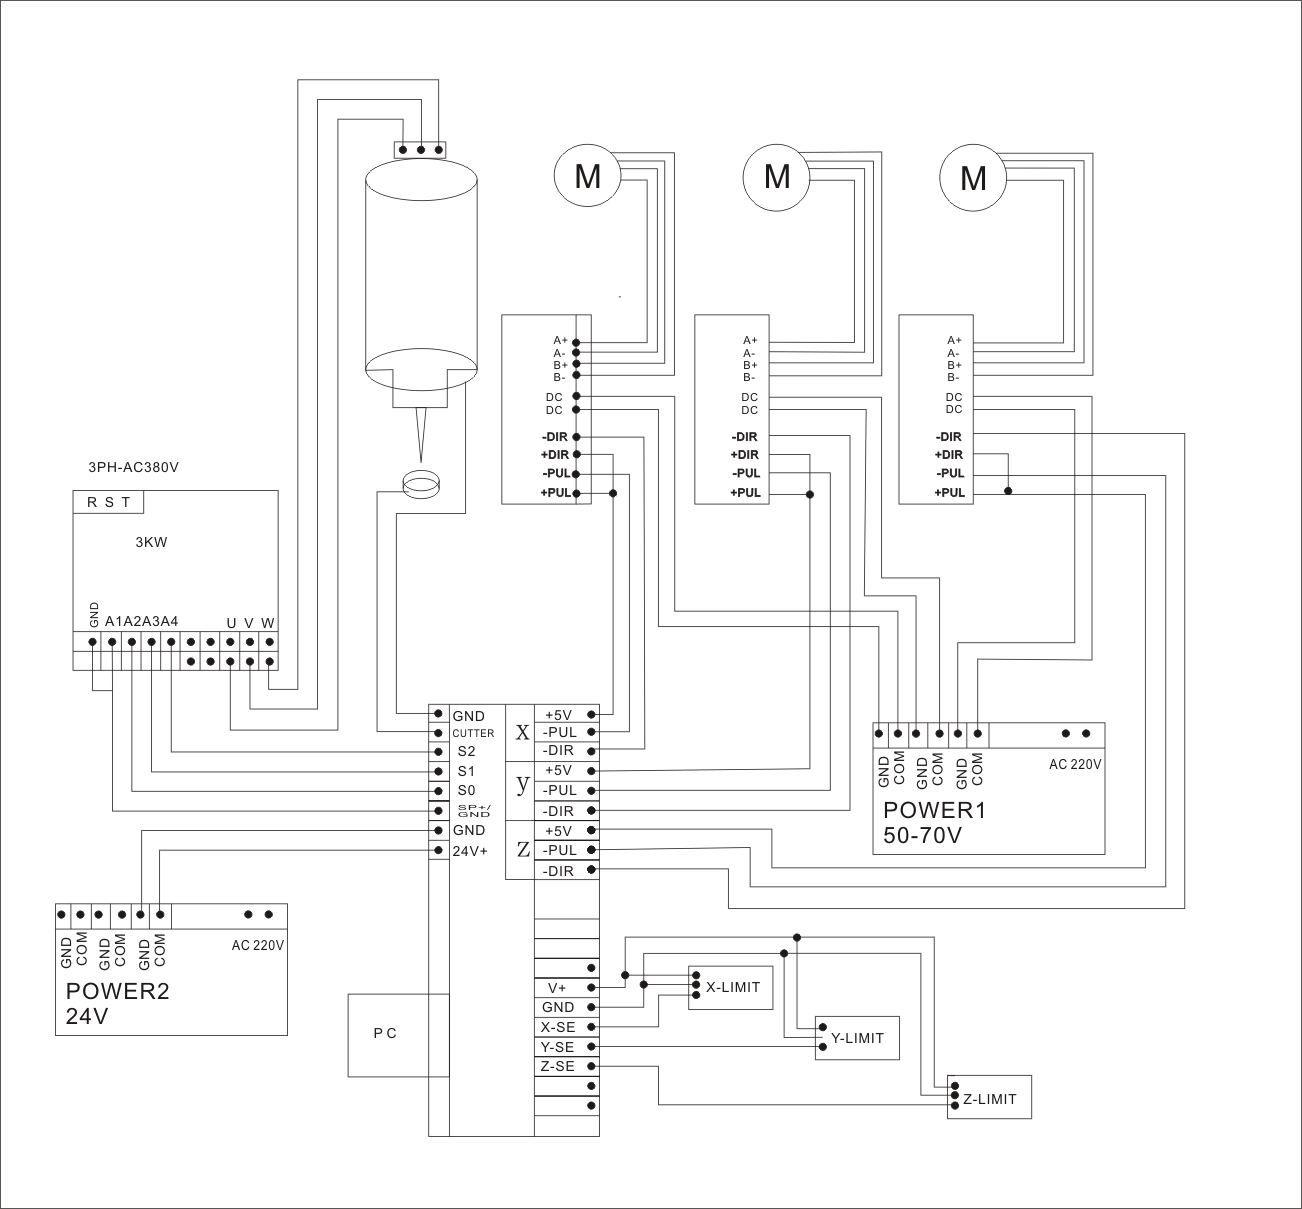 usb pinout diagram stanley garage door opener parts cnc wiring 2019 ebook library router